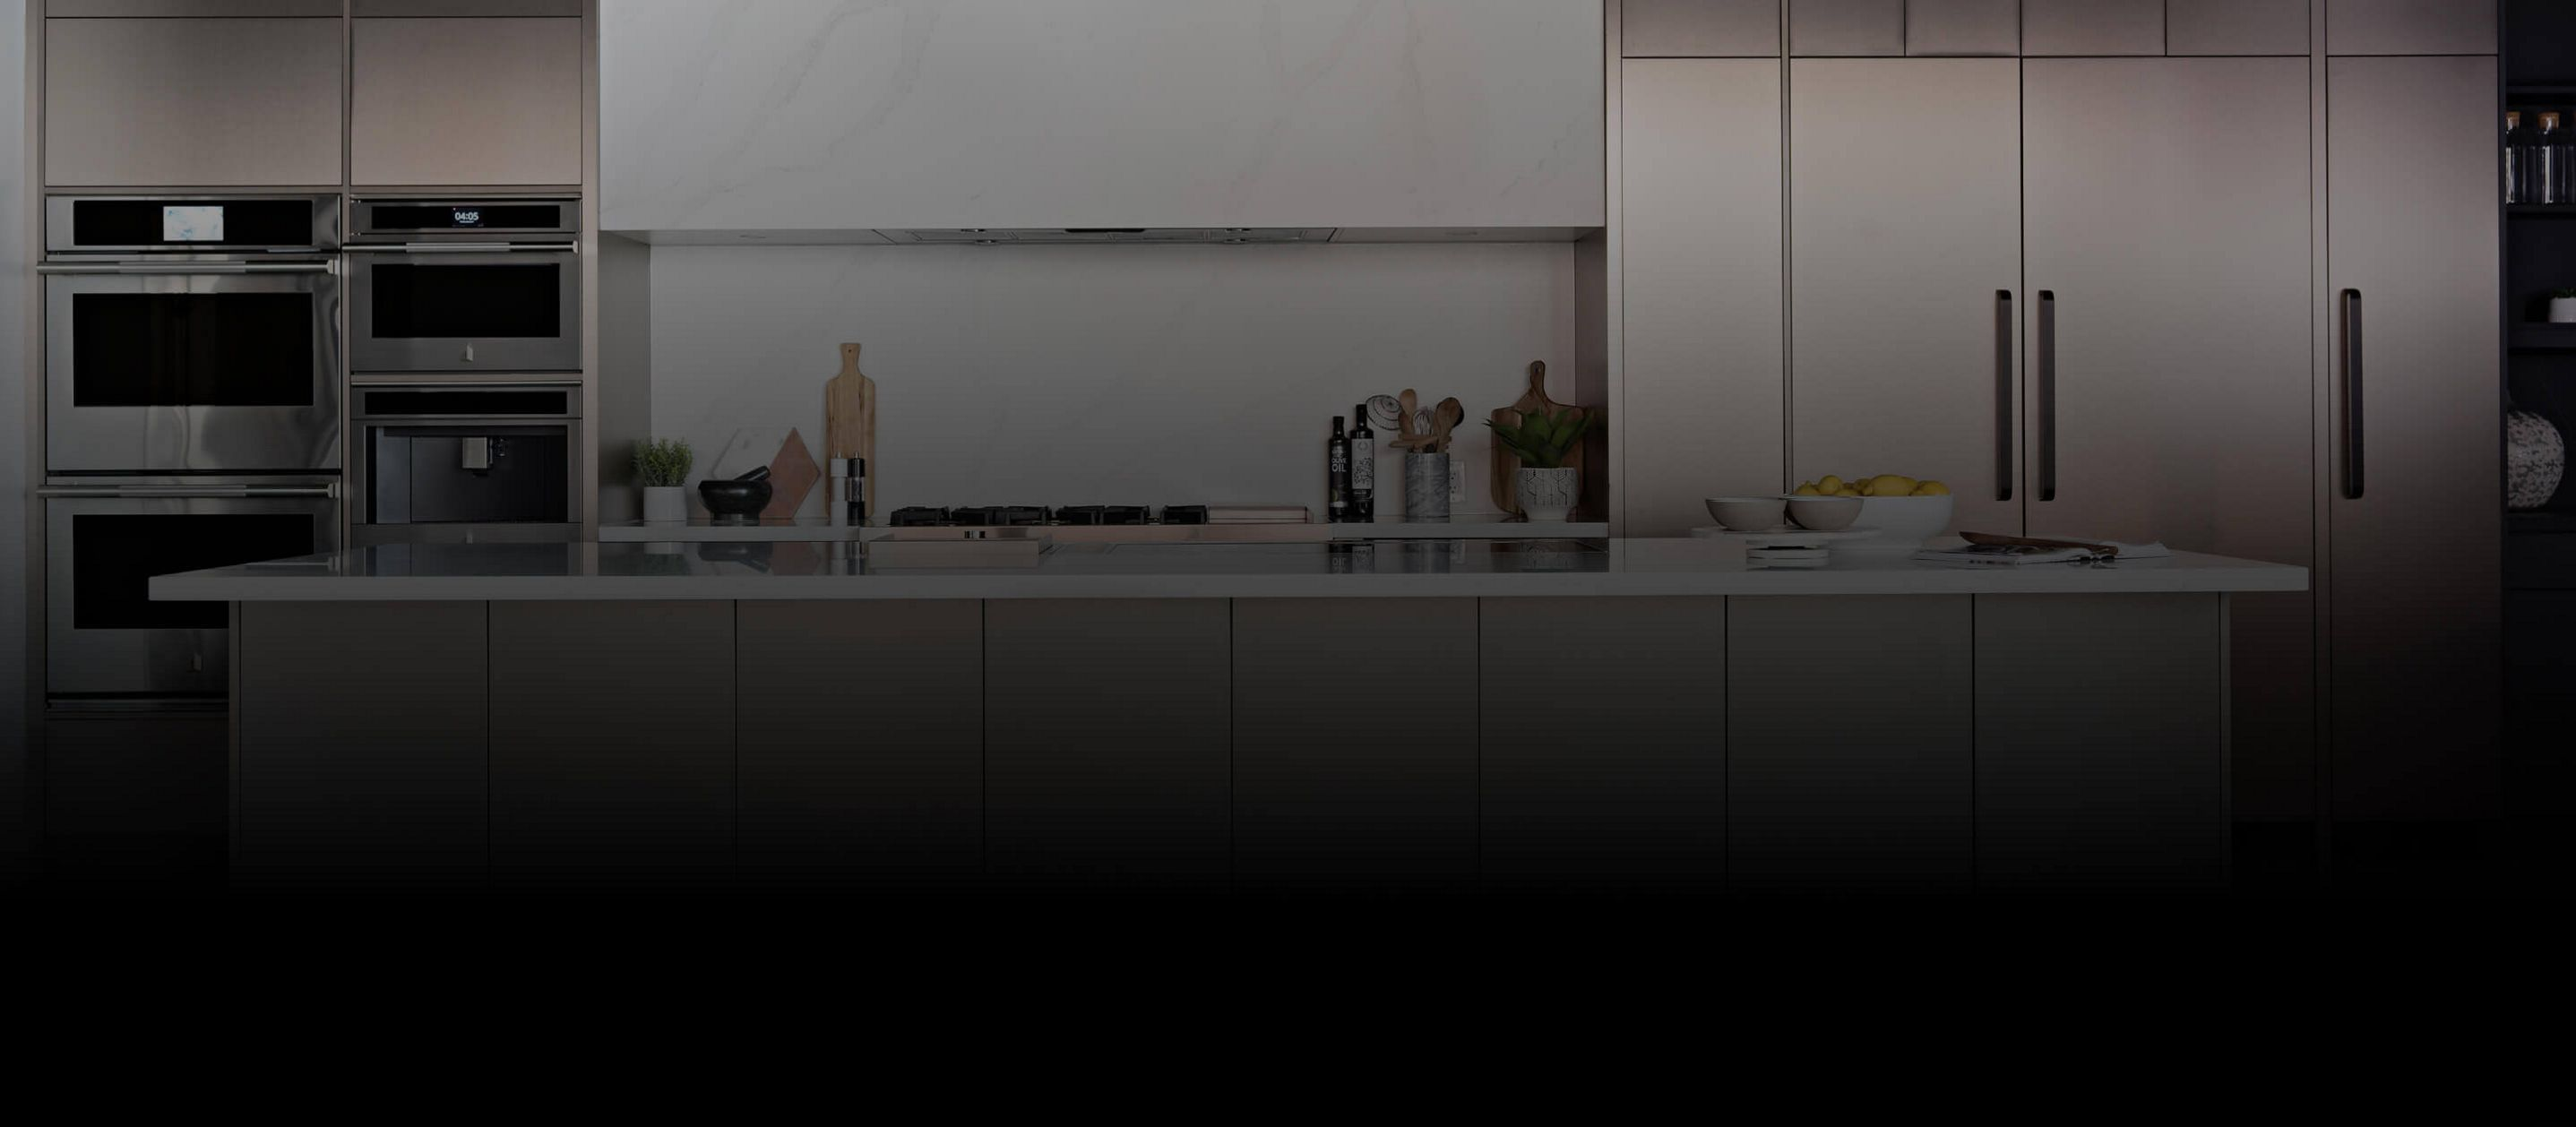 JennAir® appliances installed in a spacious kitchen.